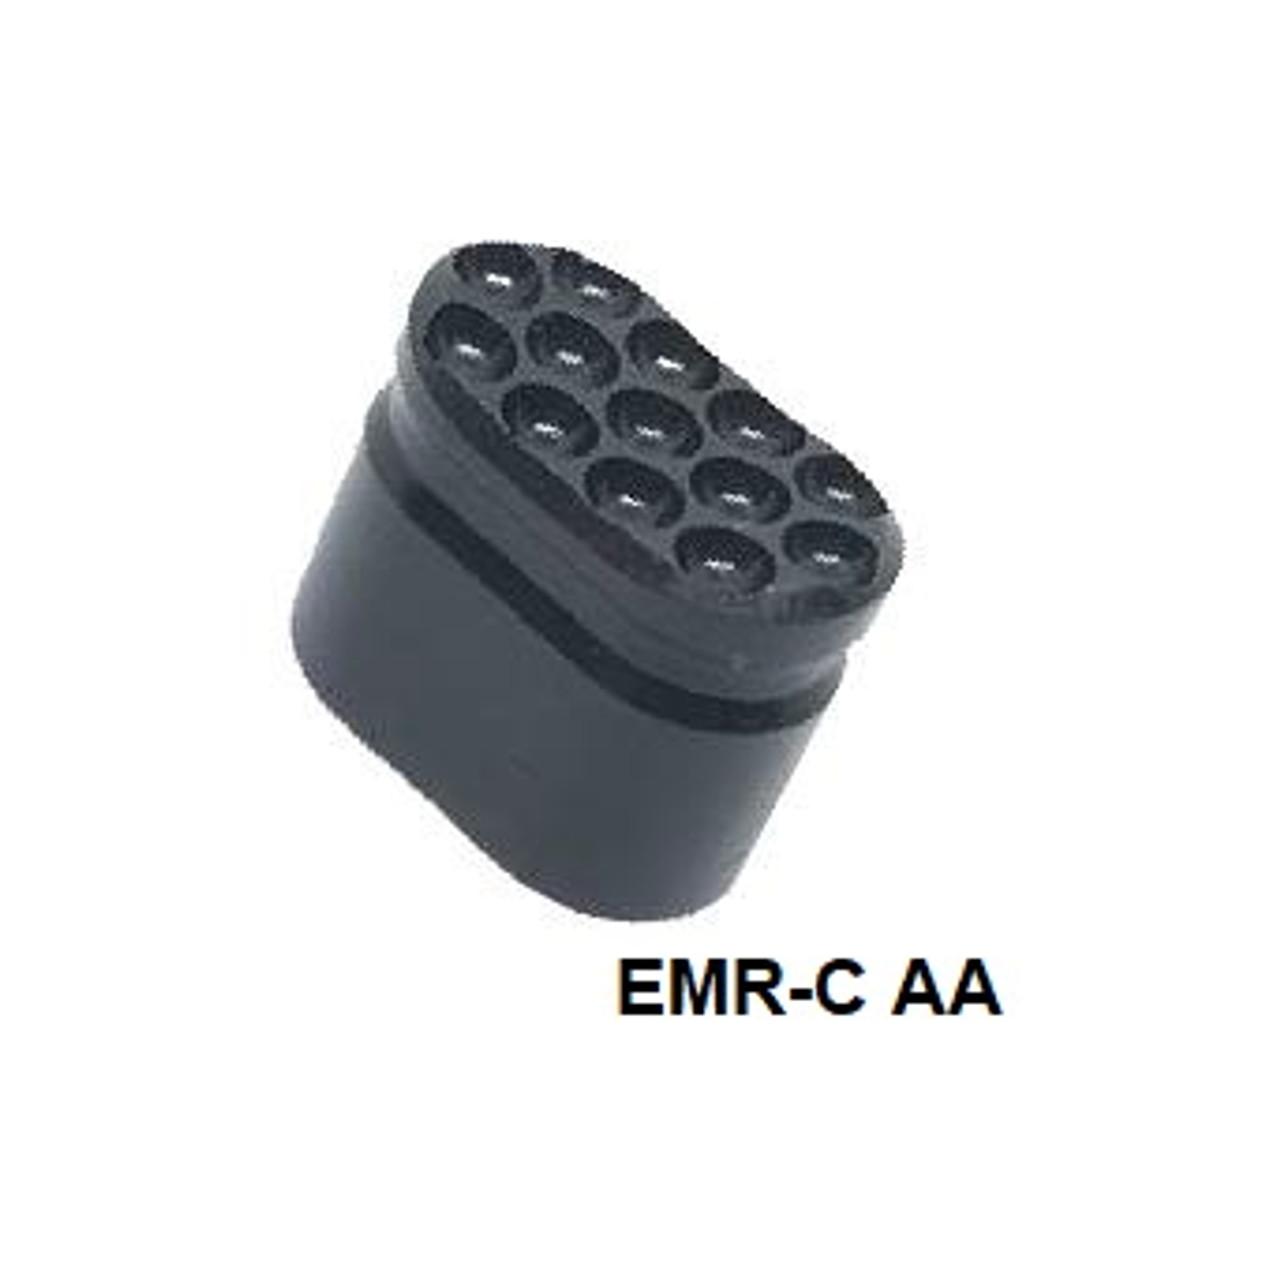 Forward Controls Design Enhanced Magazine Release - EMR-C AA